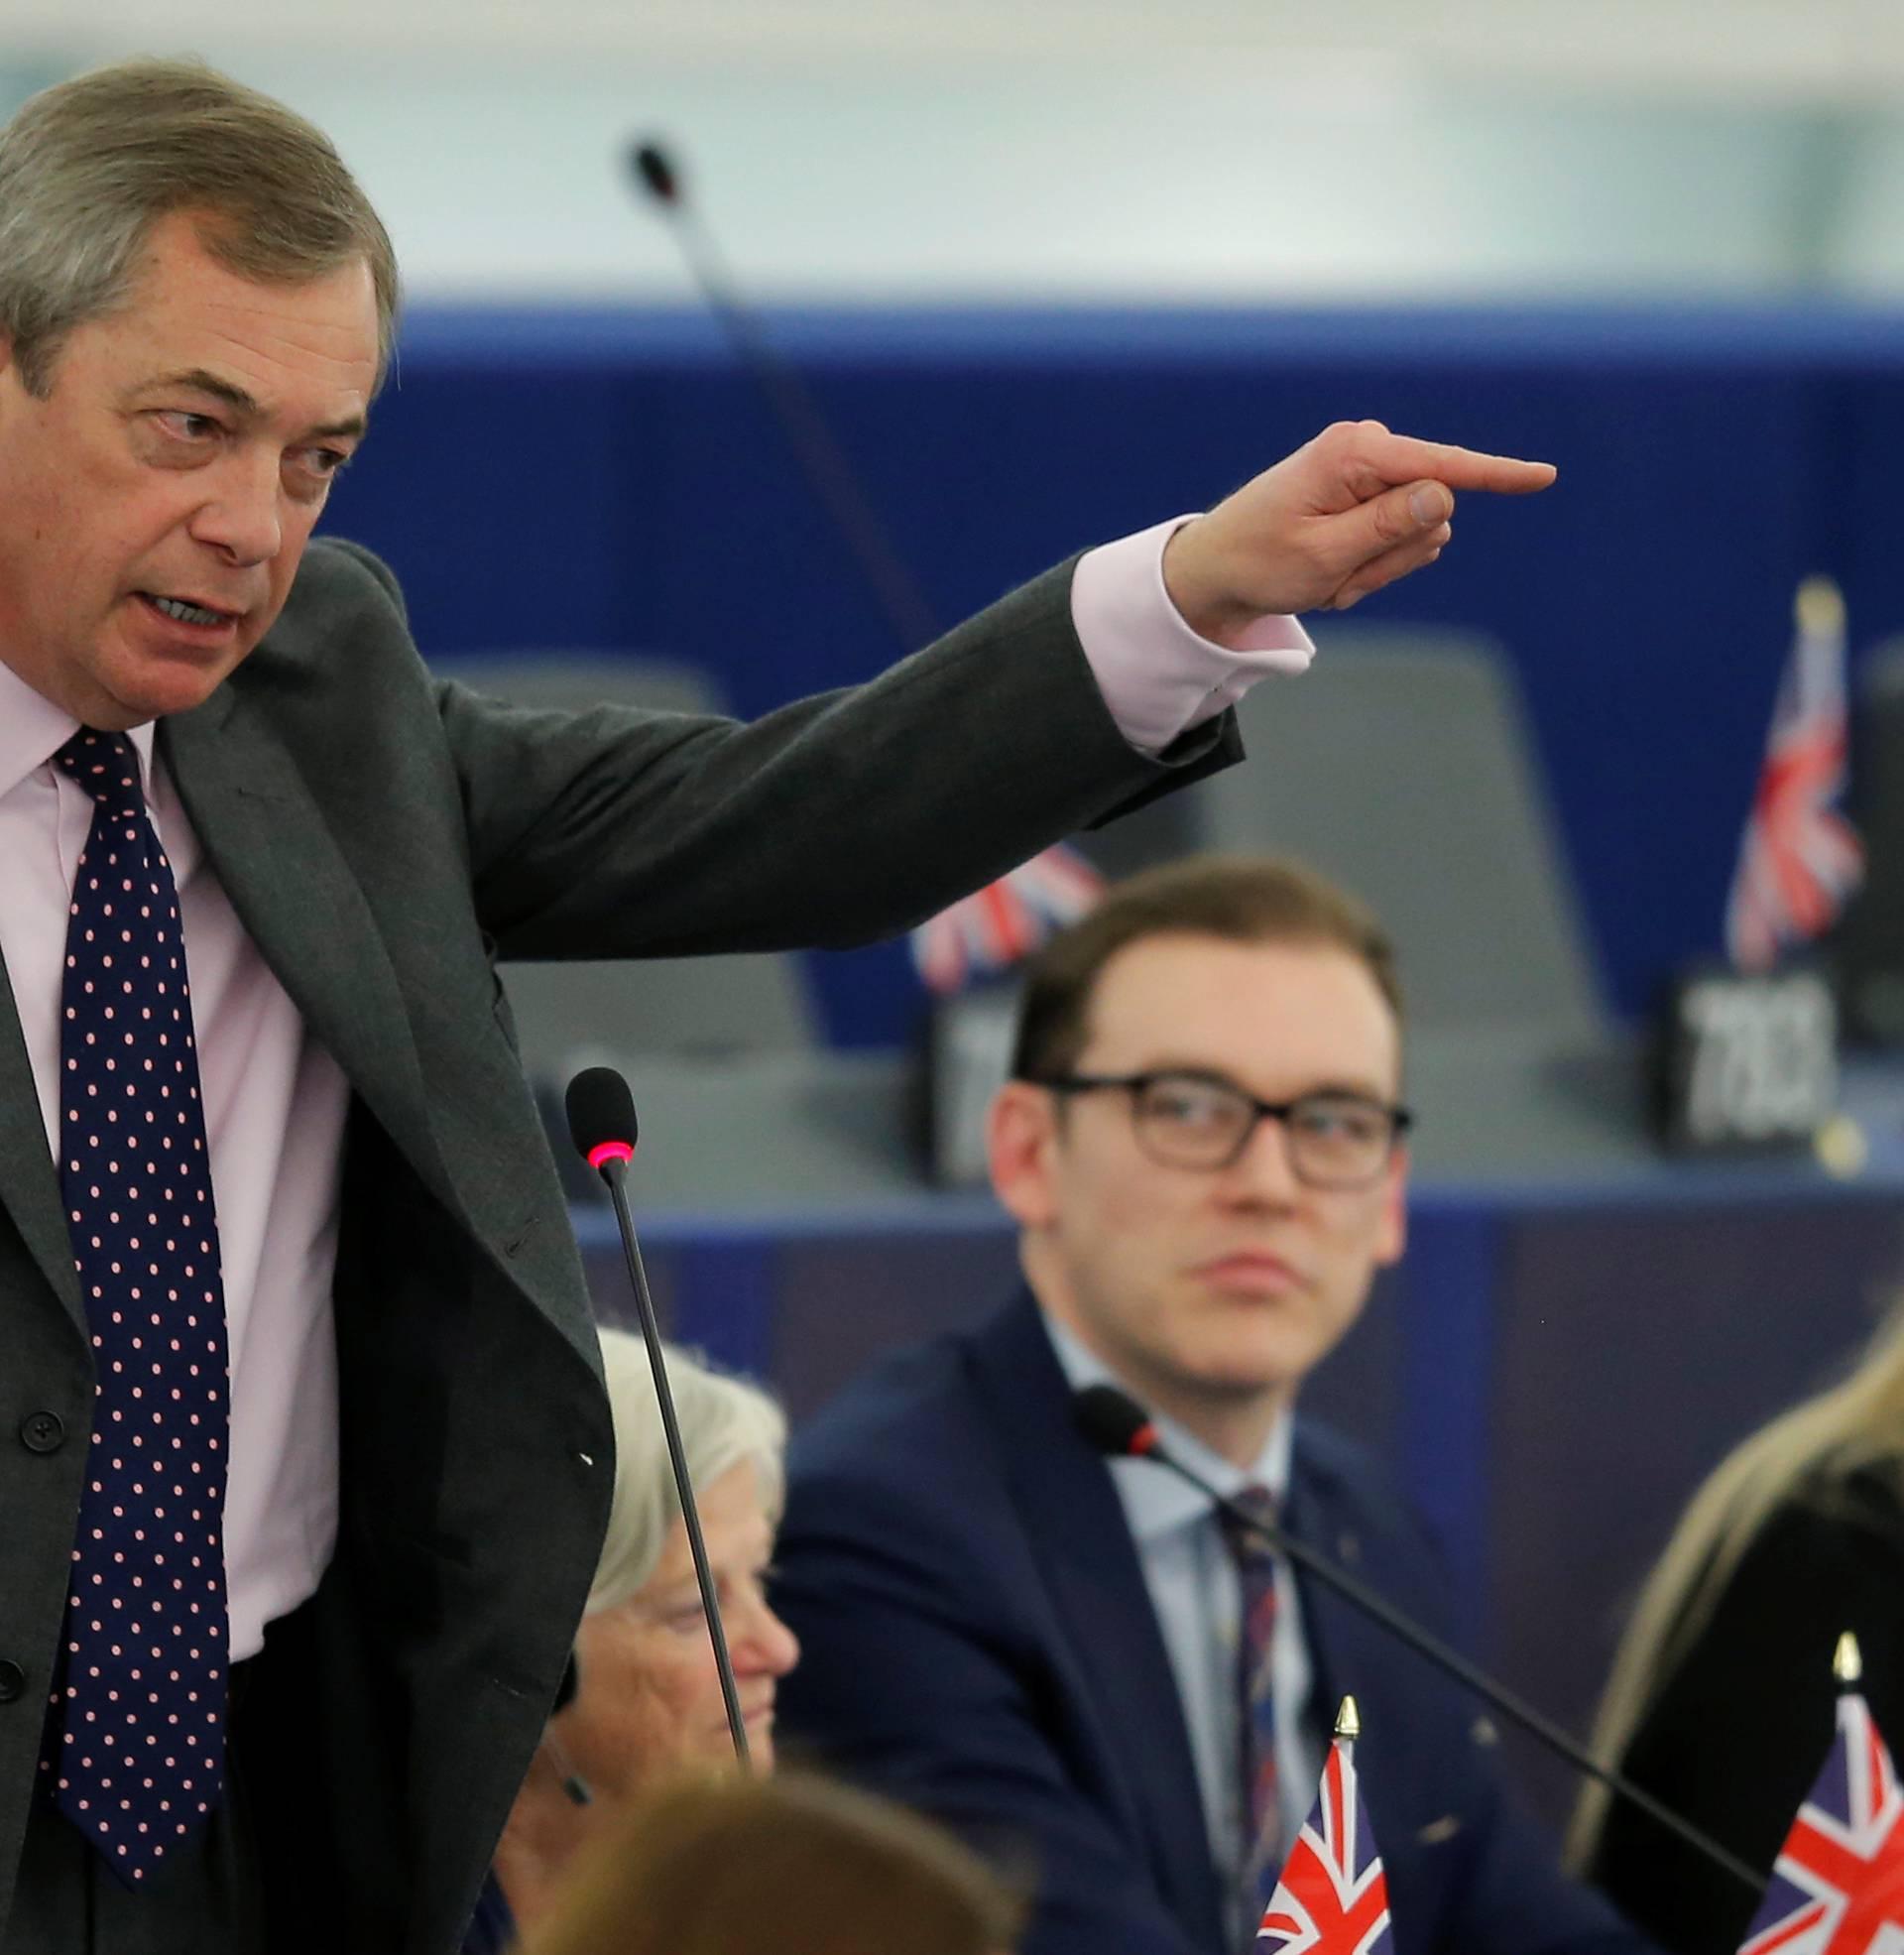 Debate on the last EU summit at the European Parliament in Strasbourg